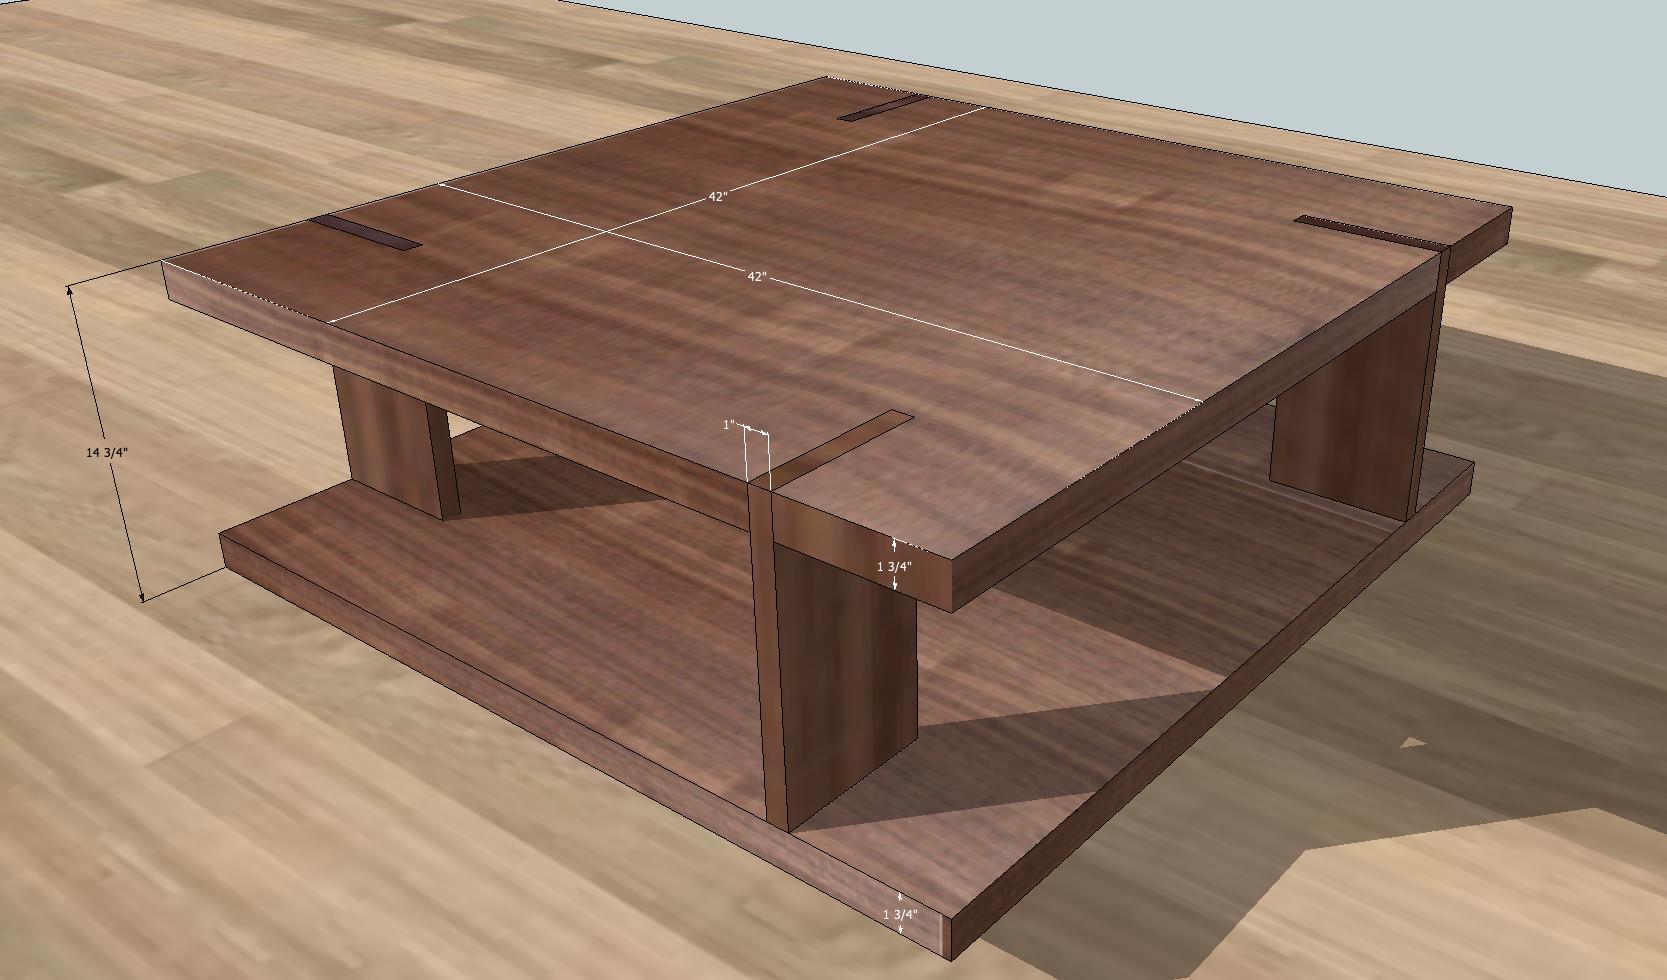 Through Tenon Modern Tables WOODWEBs Furniture Making Forum - Furniture forum